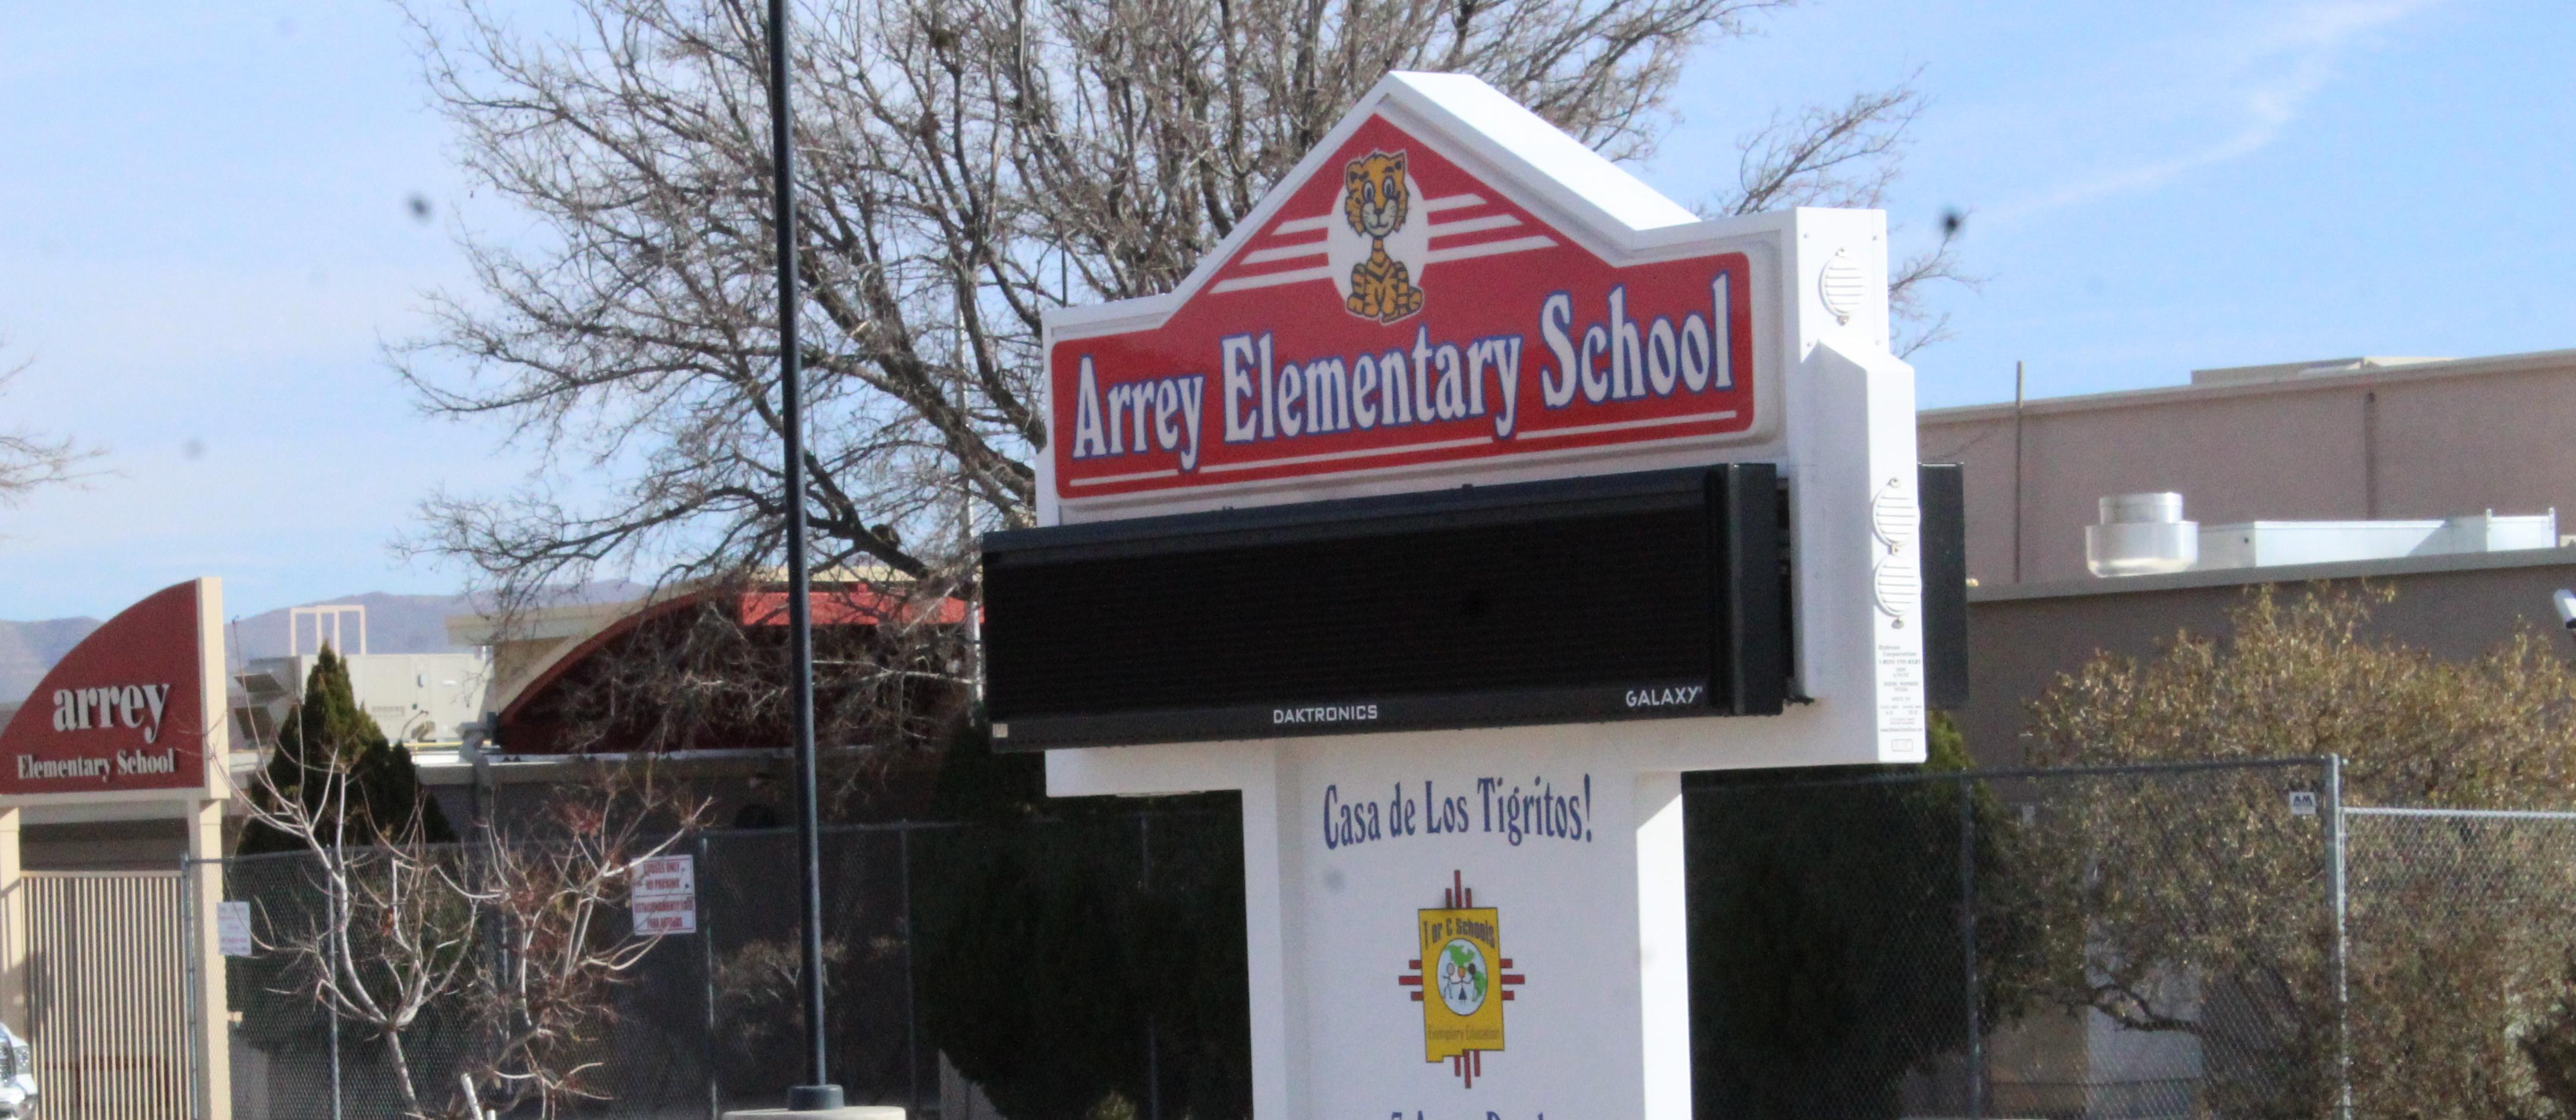 Arrey Elementary School